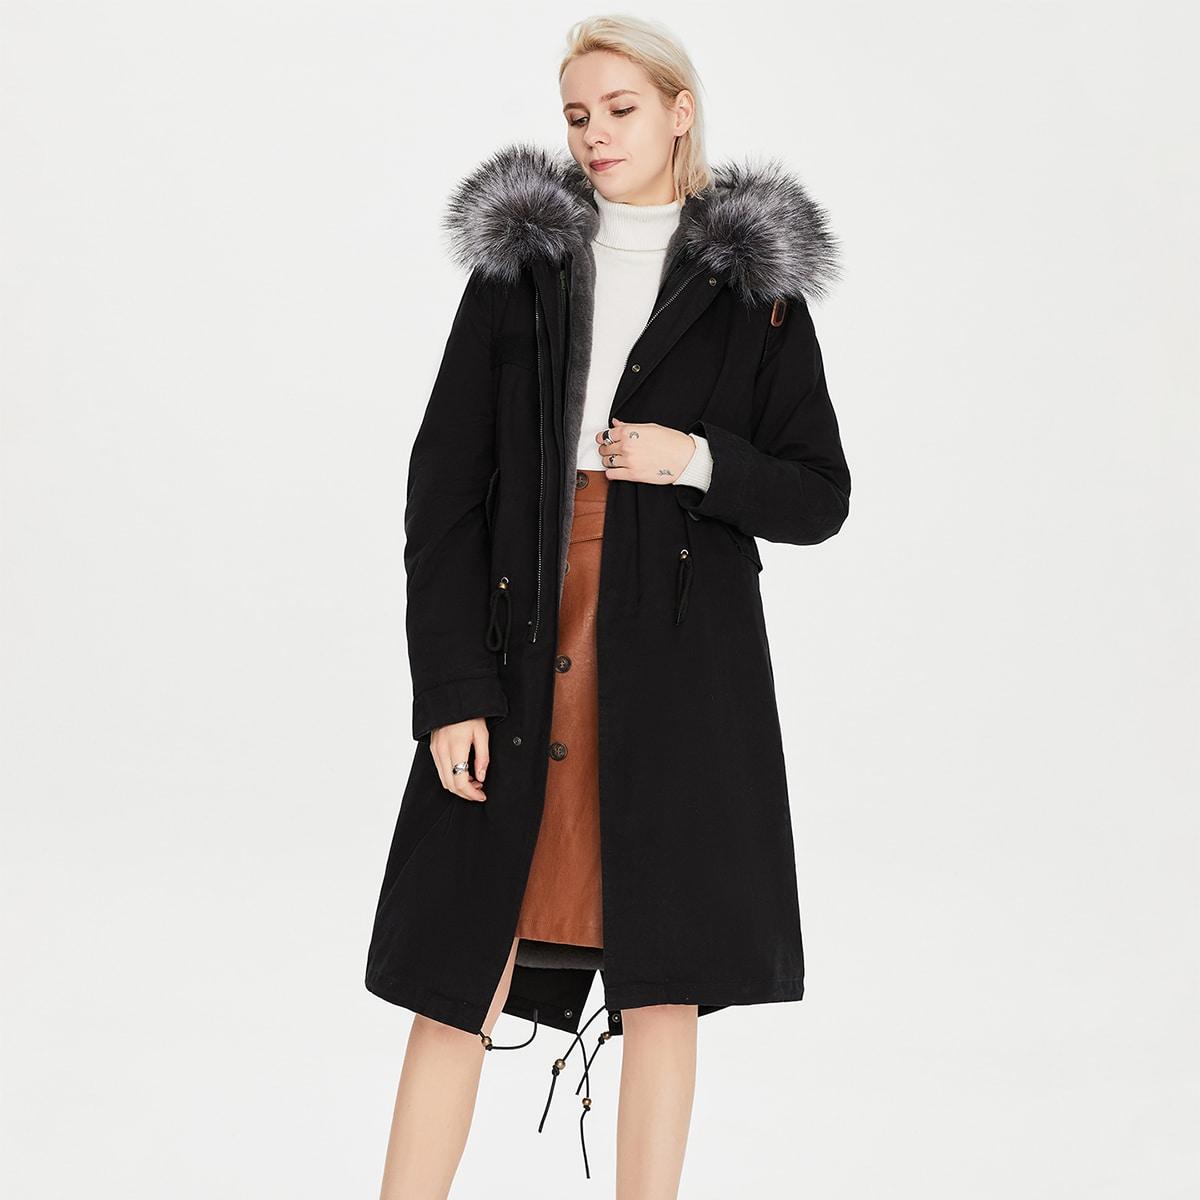 Drawstring Waist Contrast Faux Fur Hooded Parka Coat